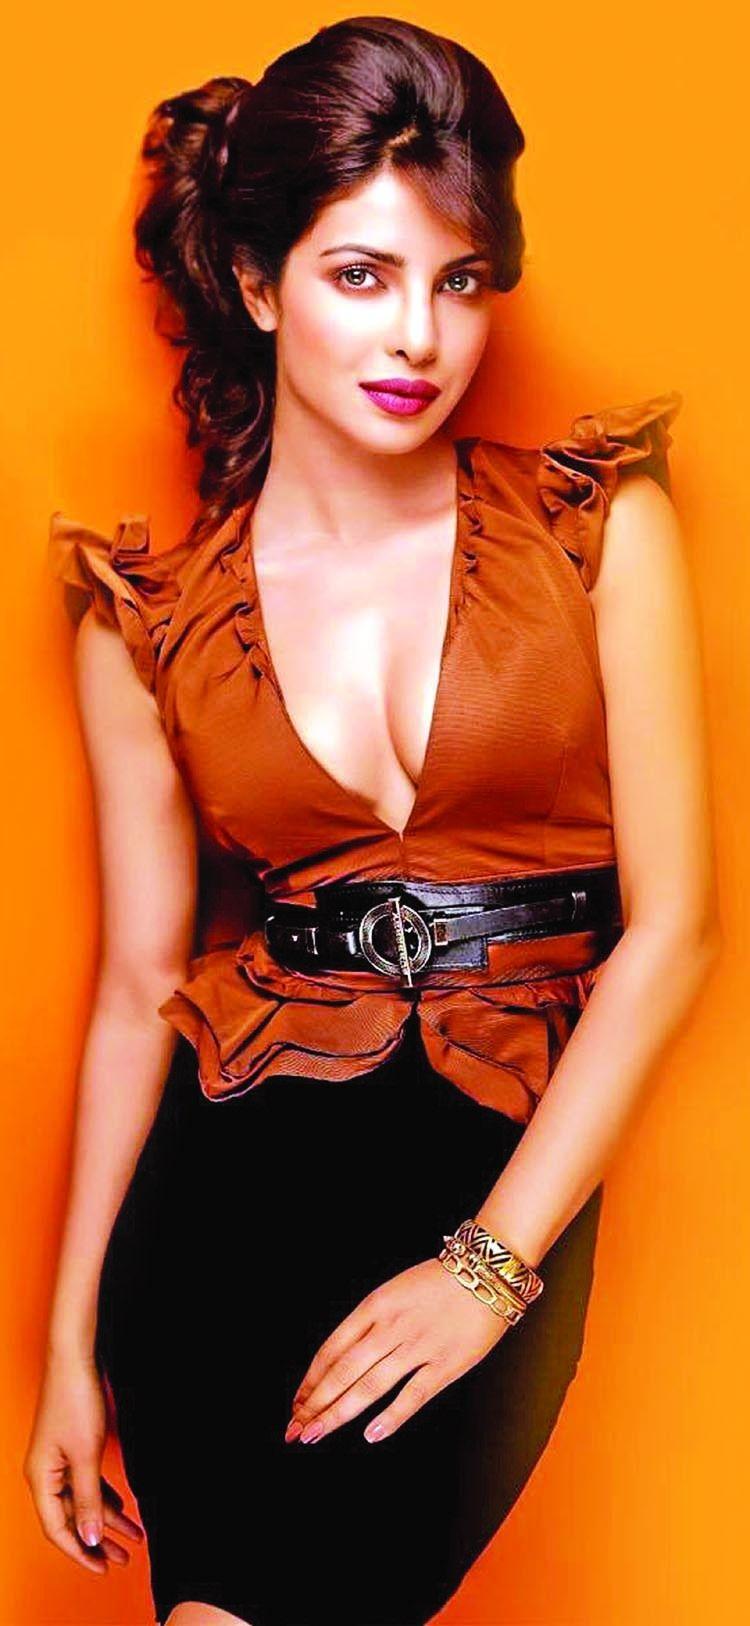 Priyanka Deepika And Aishwarya Feature In World S Most Admired People 2018 List The Asian Age Online Bangladesh Priyanka Chopra Bikini Priyanka Chopra Hot Actress Priyanka Chopra